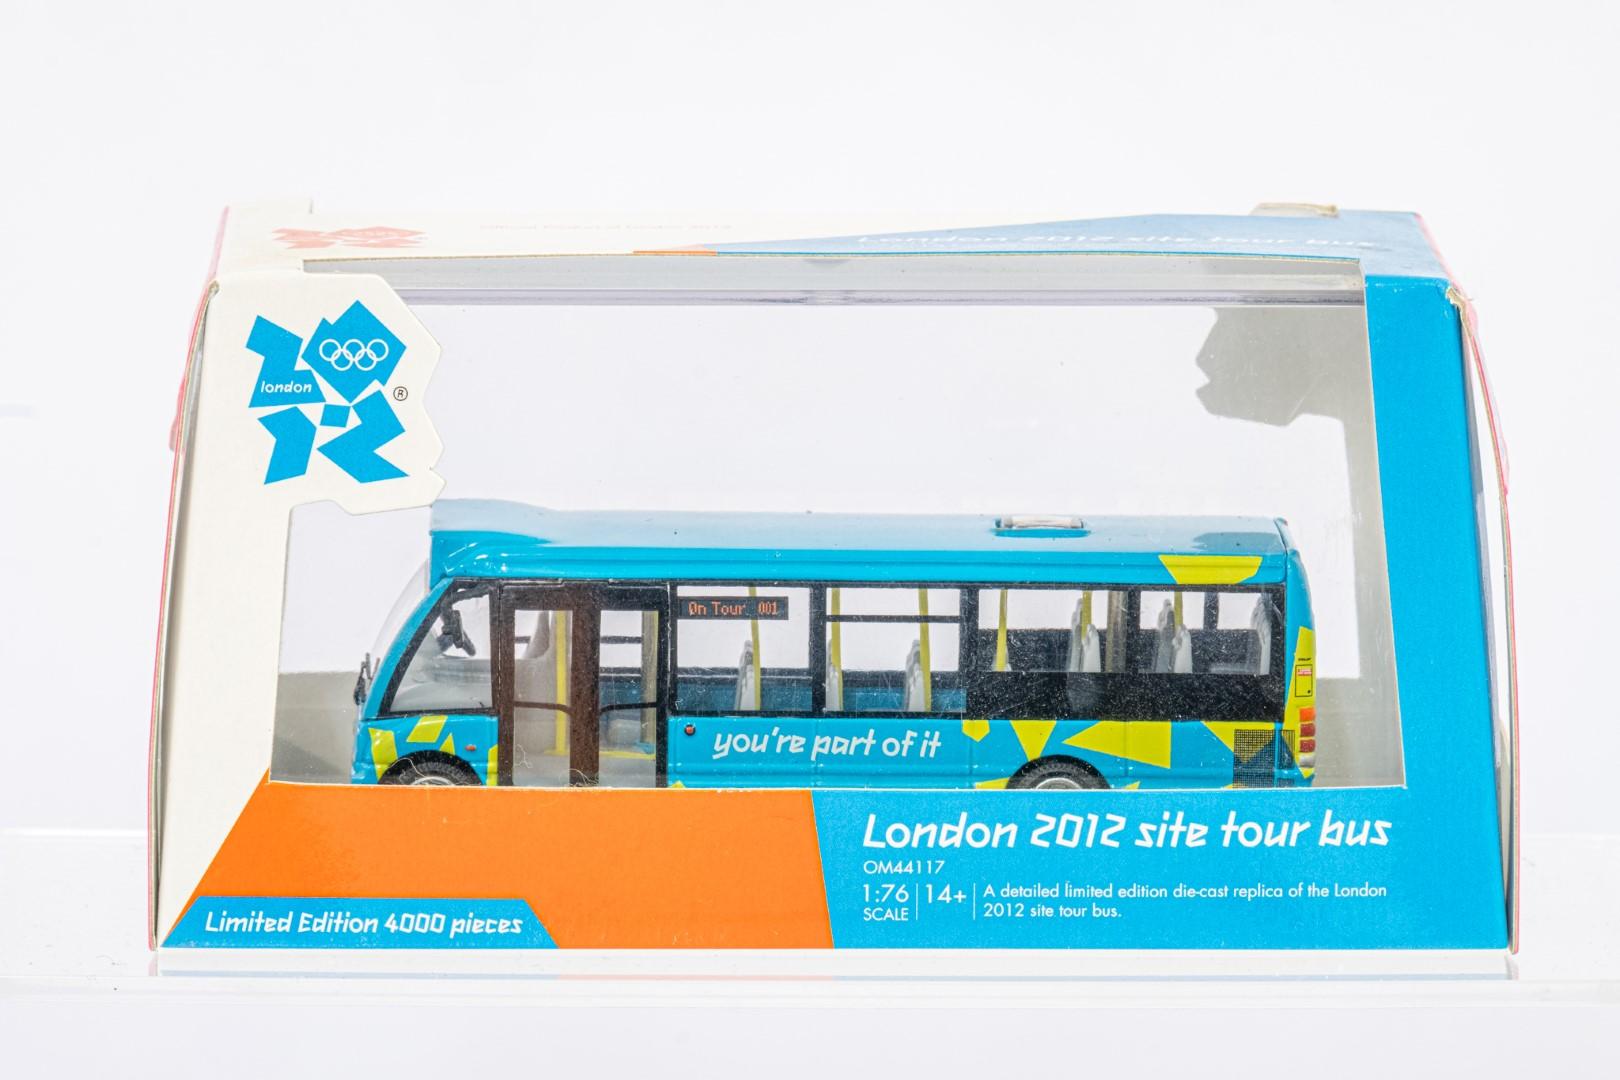 2 x bus models - Corgi OM44117 London 2012 & Matchbox KRW-15 The Royal Wedding - Image 2 of 3